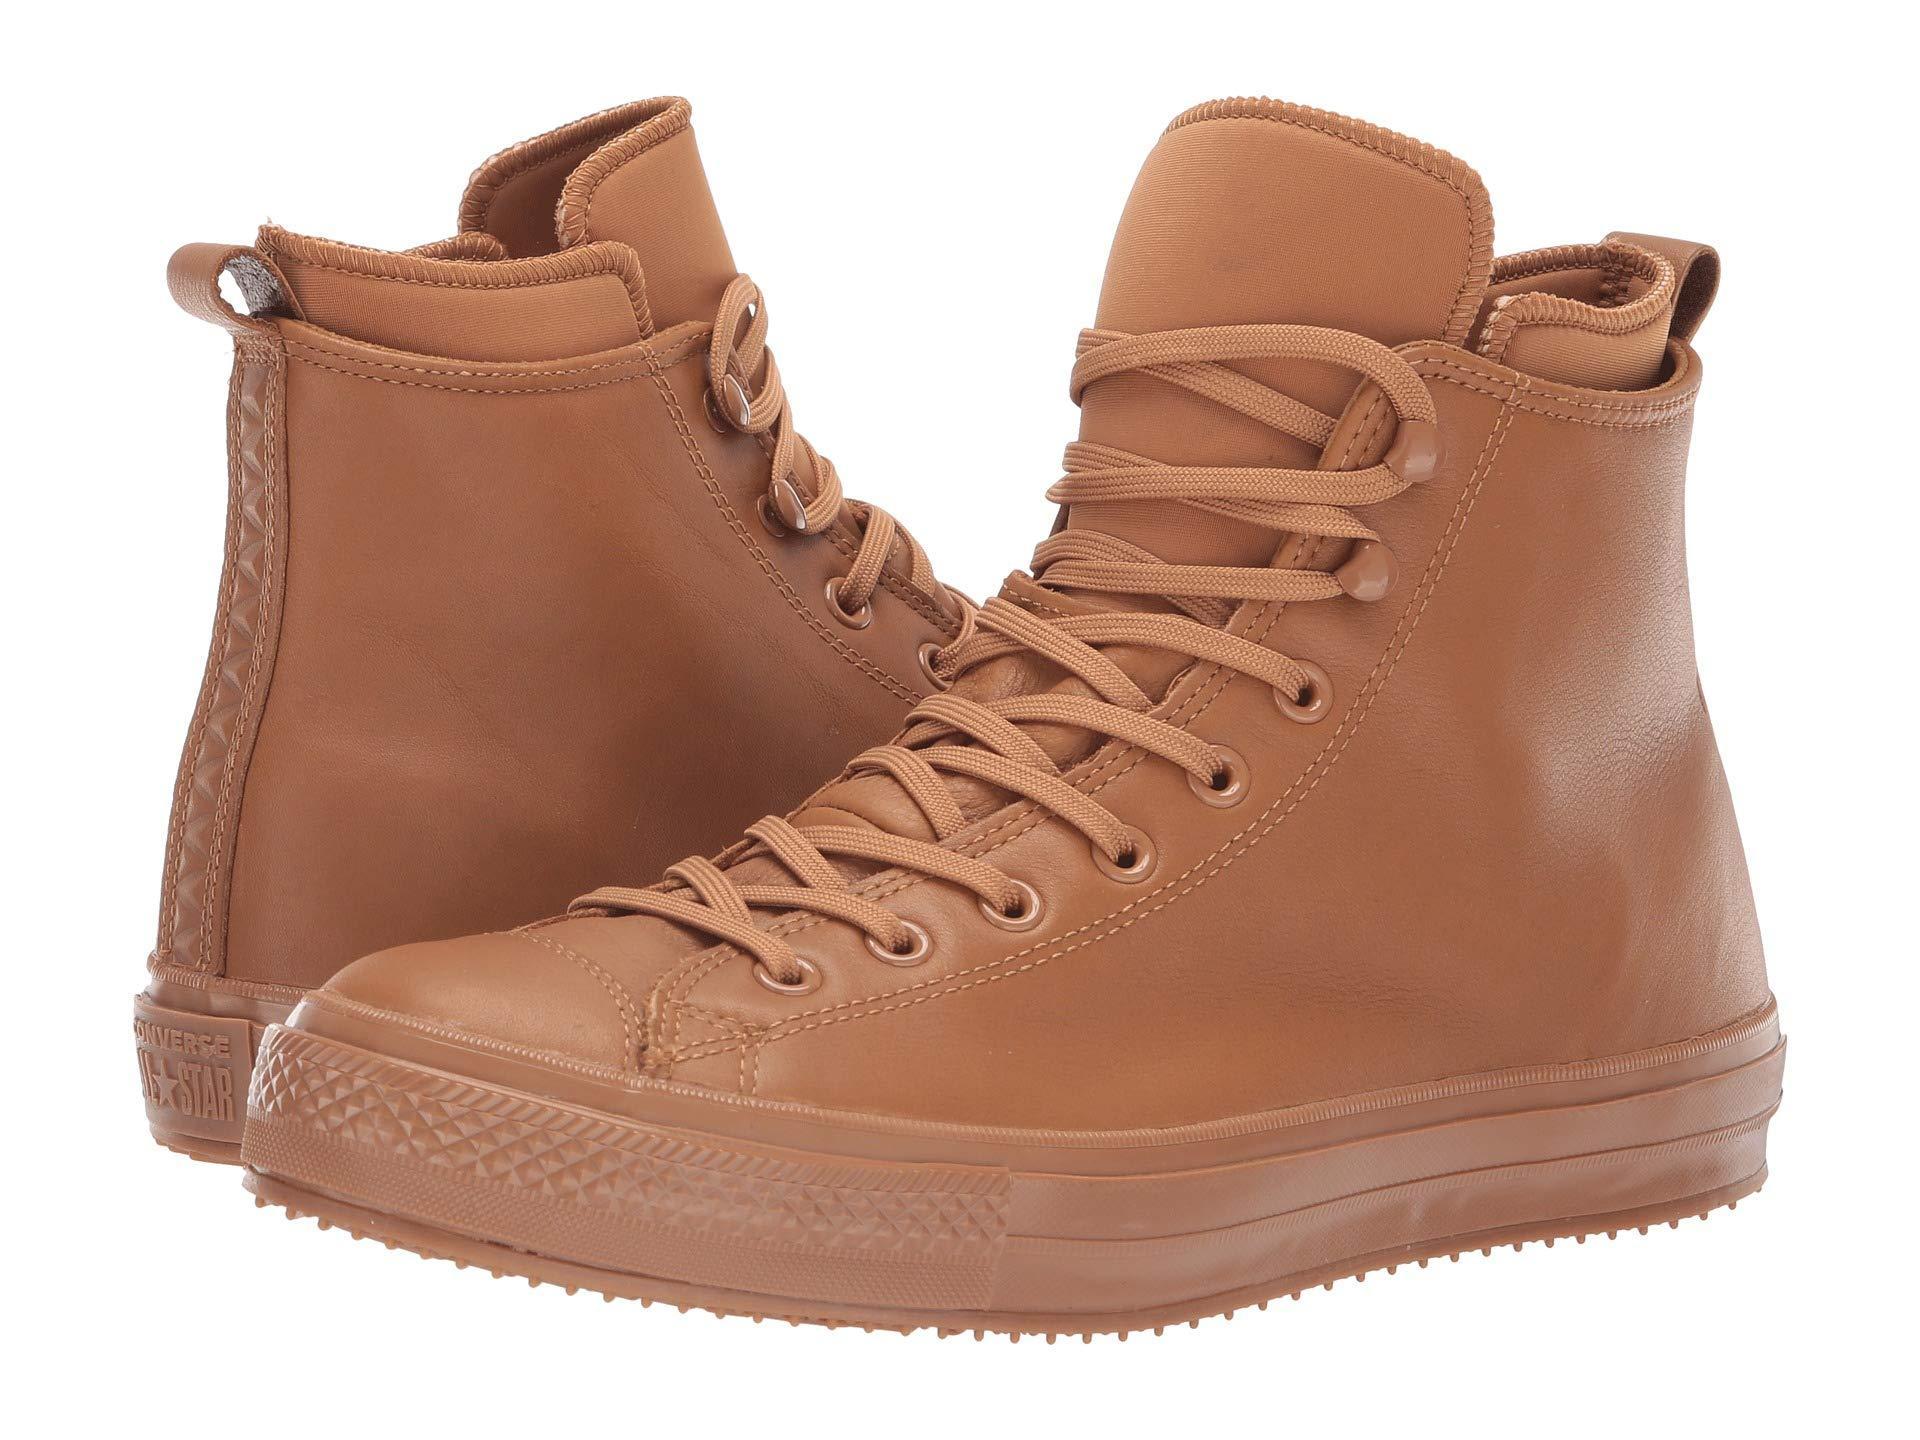 954d43e5d9d4ee Lyst - Converse Chuck Taylor All Star Waterproof Boot - Hi in Brown